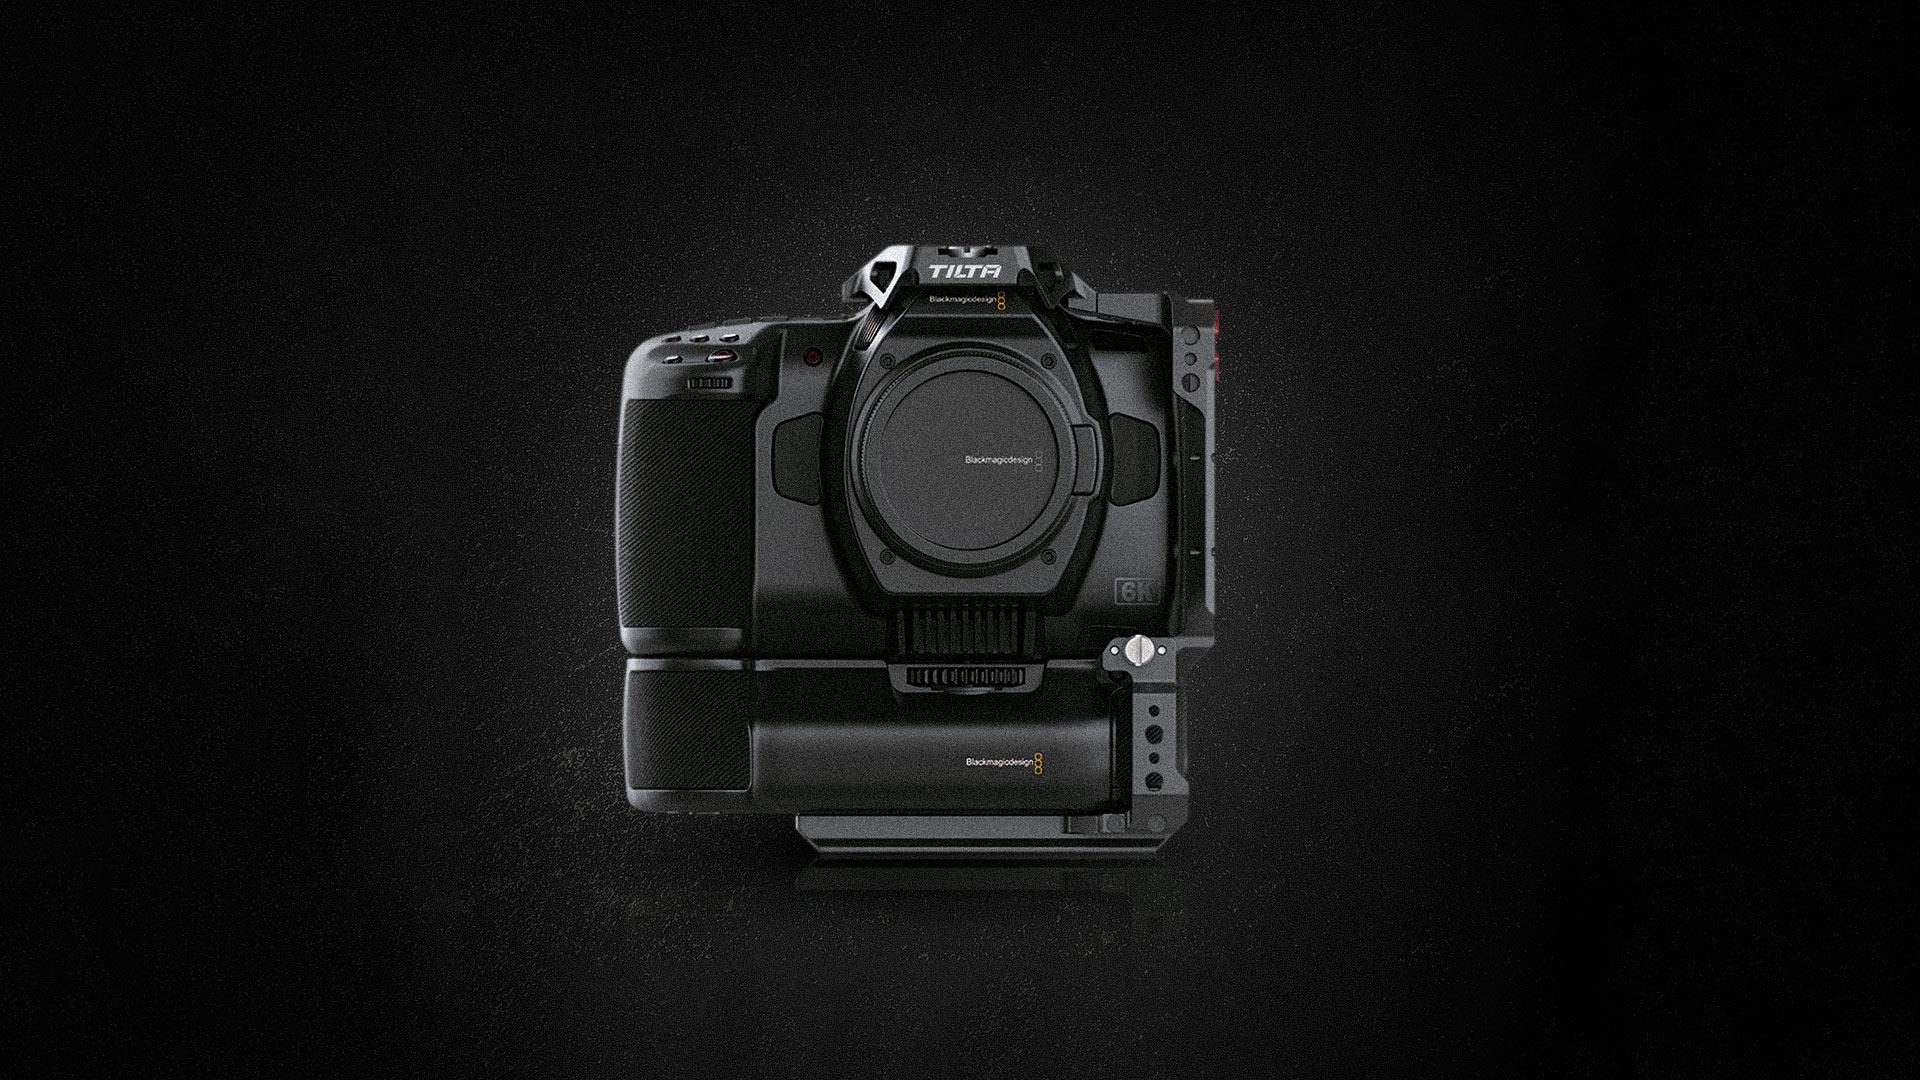 tilta bmpcc 6k pro camera cage intro